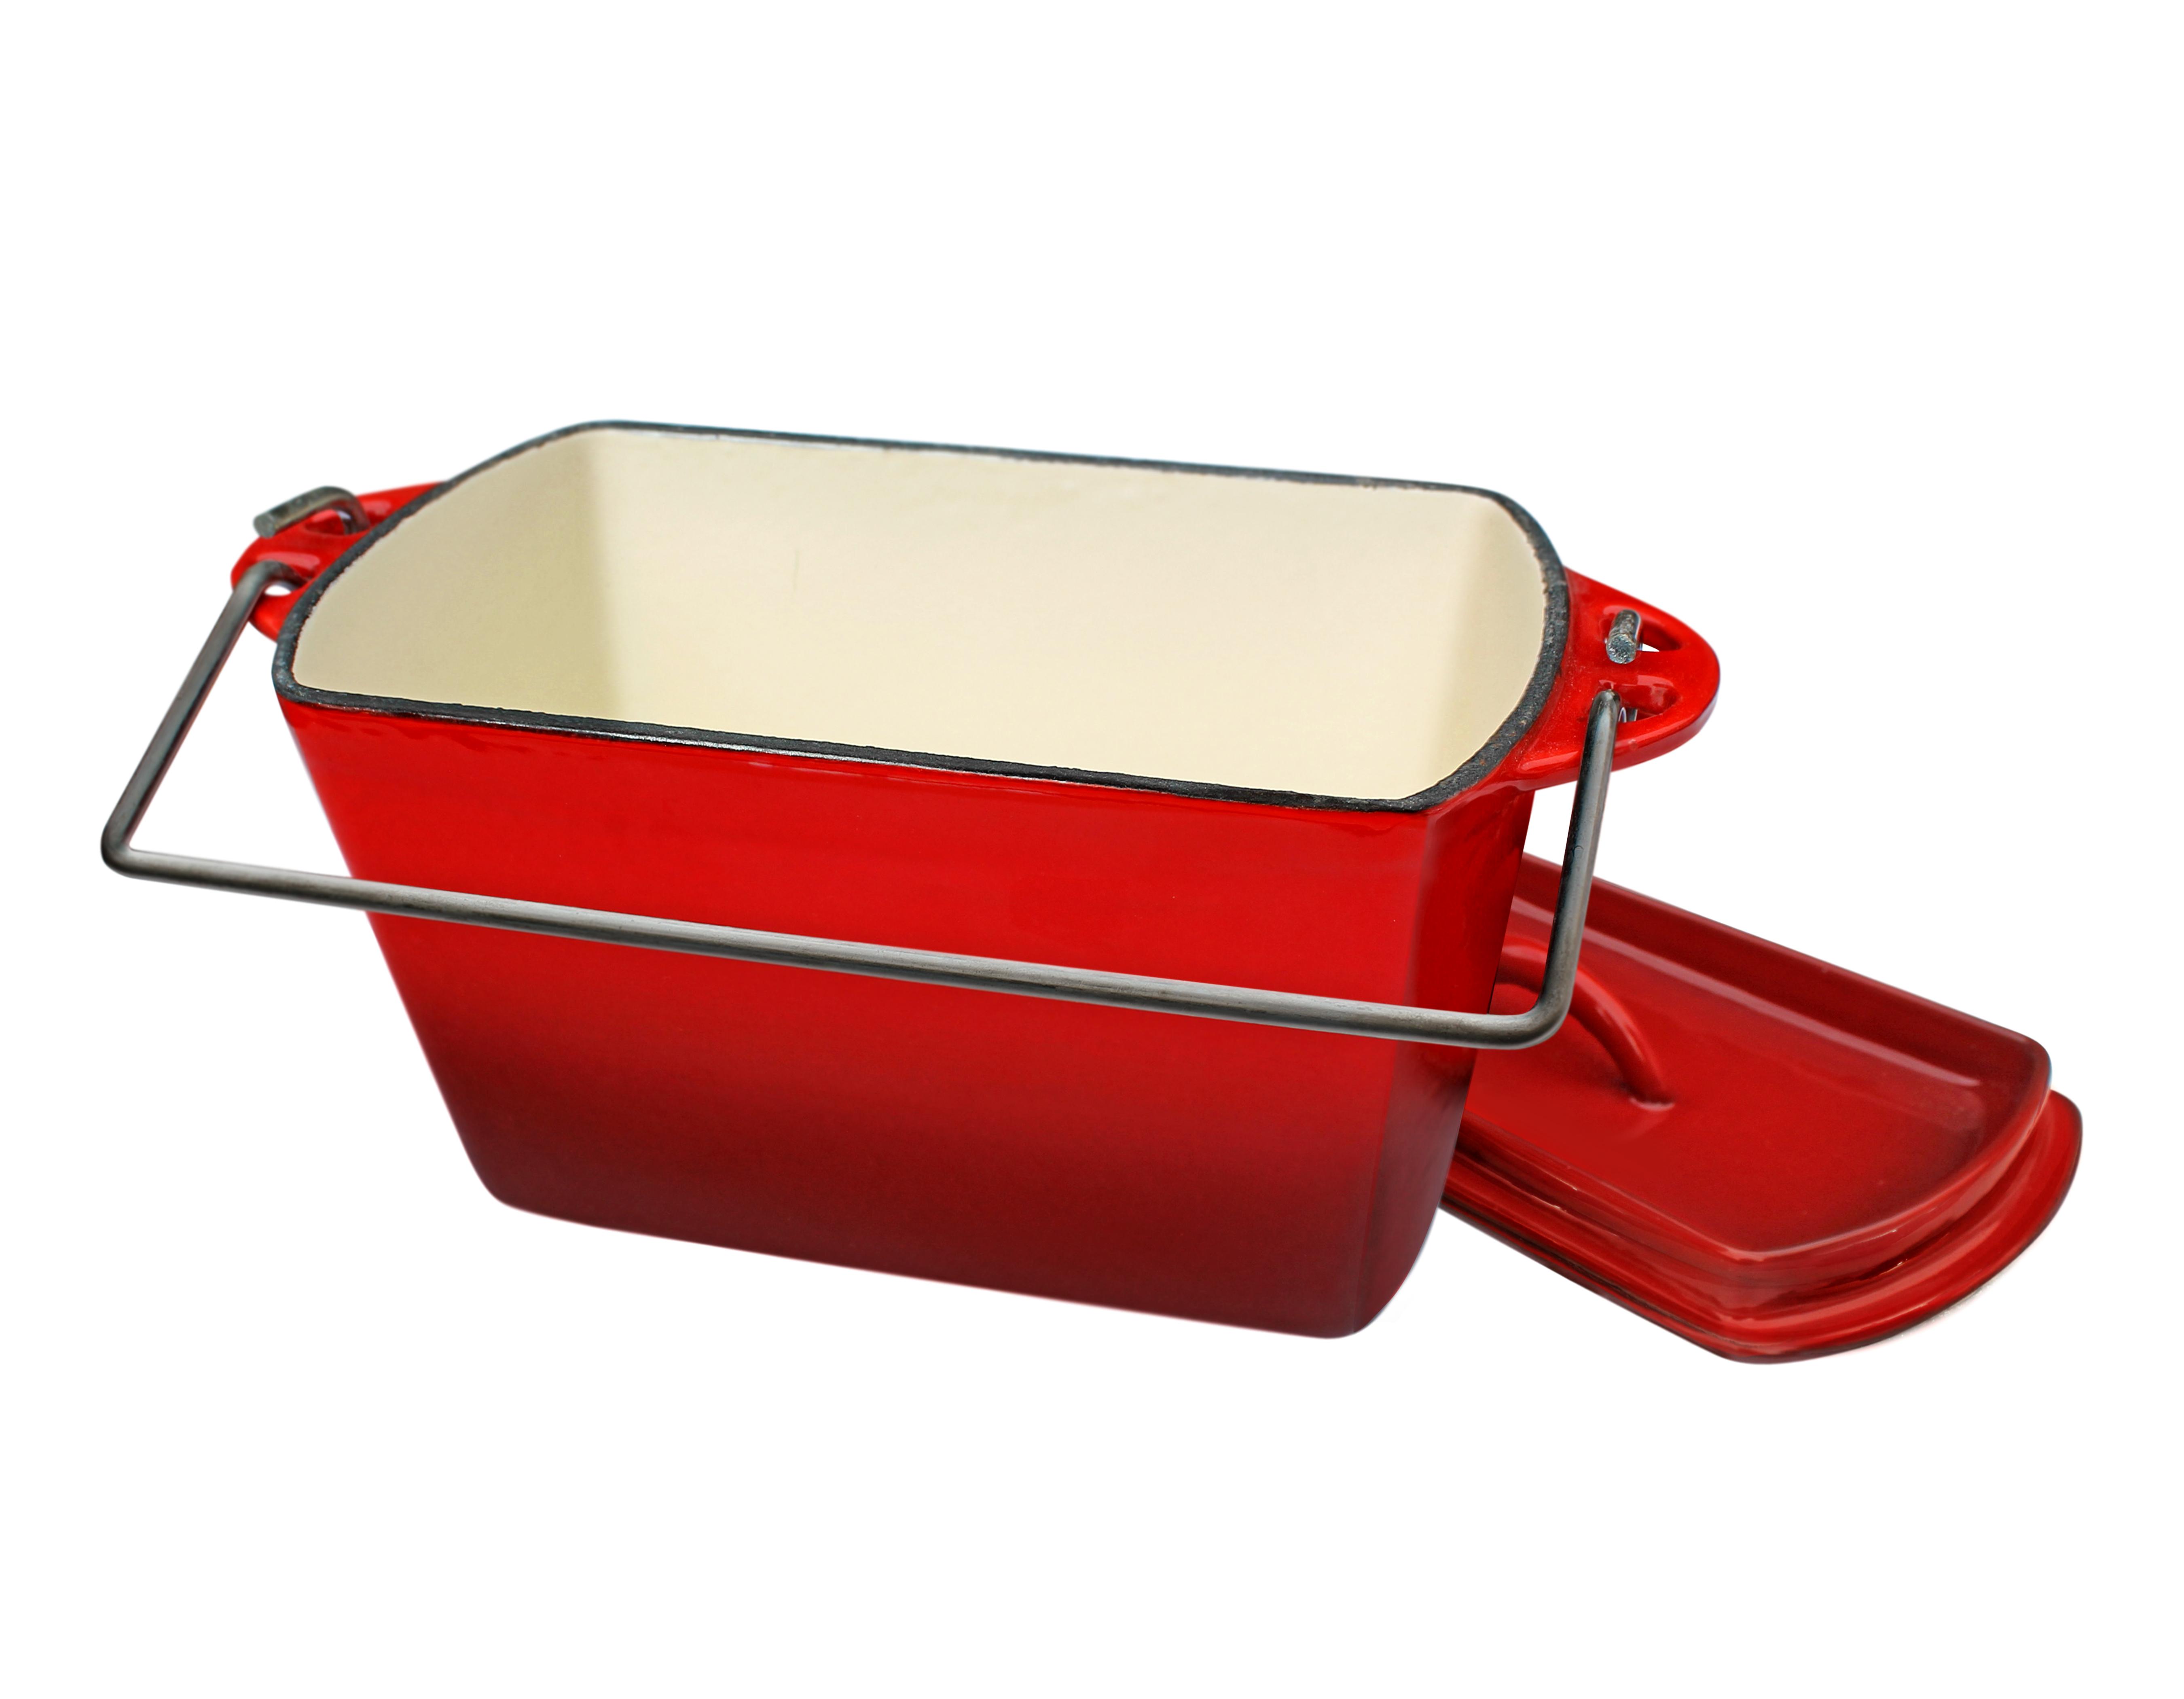 lk&rsquos-bread-pot-red-enamel-14538